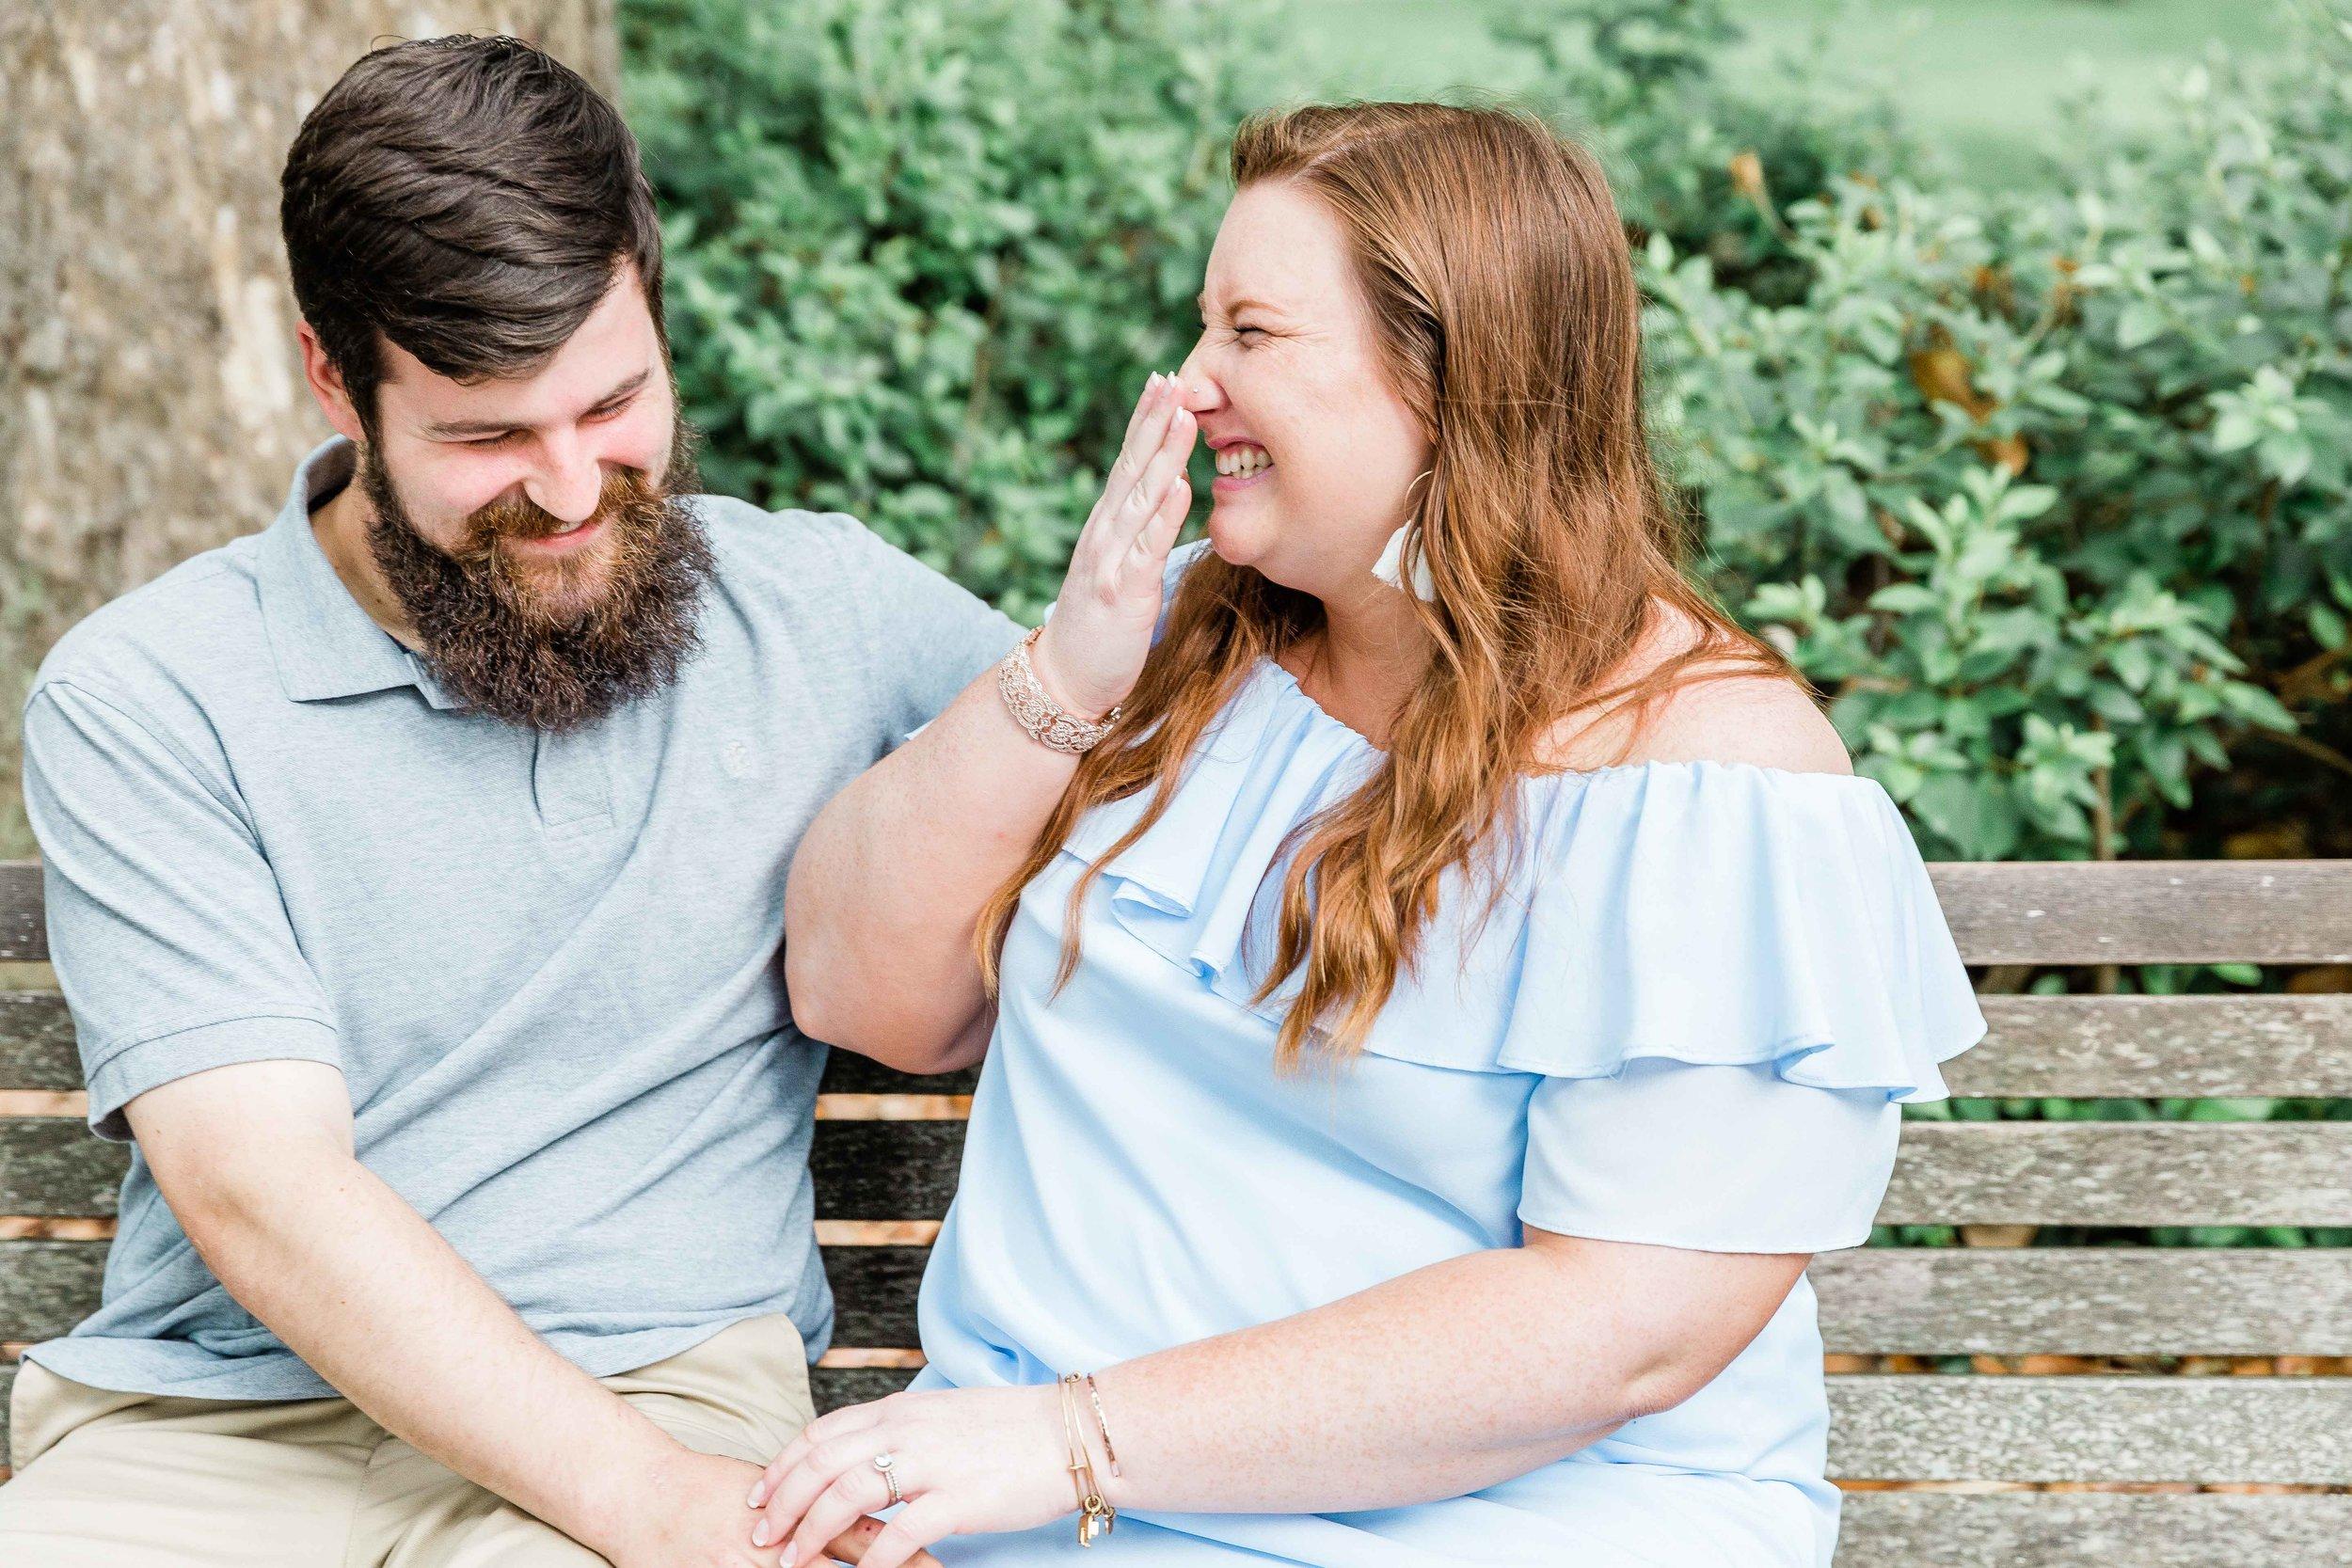 20190505-Southern Lens Photography- Savannah Wedding Photographer-Screven and Caroline-201910.jpg